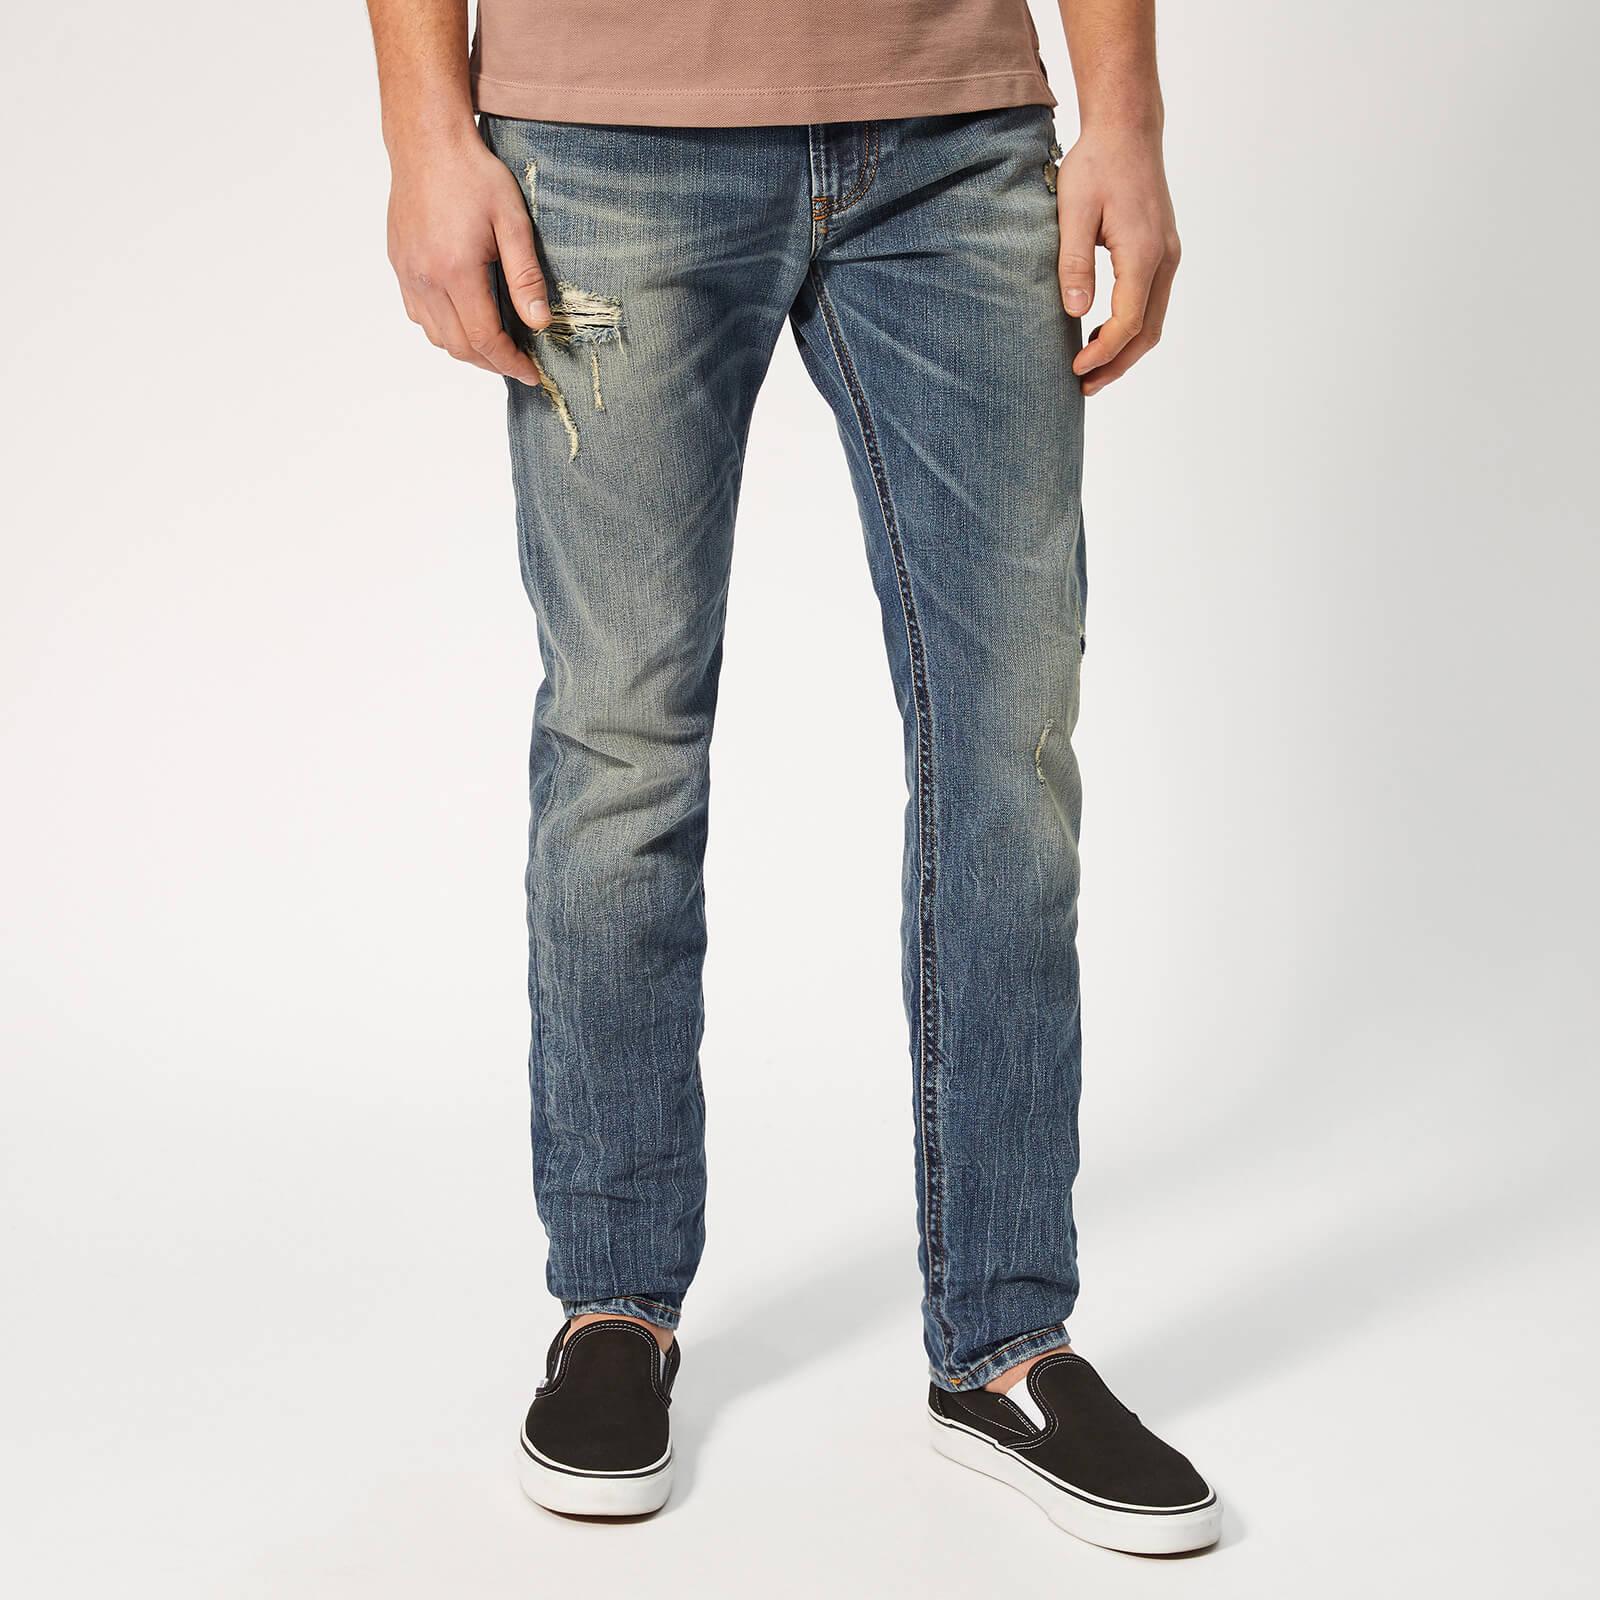 Diesel Men's Thommer Skinny Jeans - Blue - W36/L32 - Blue